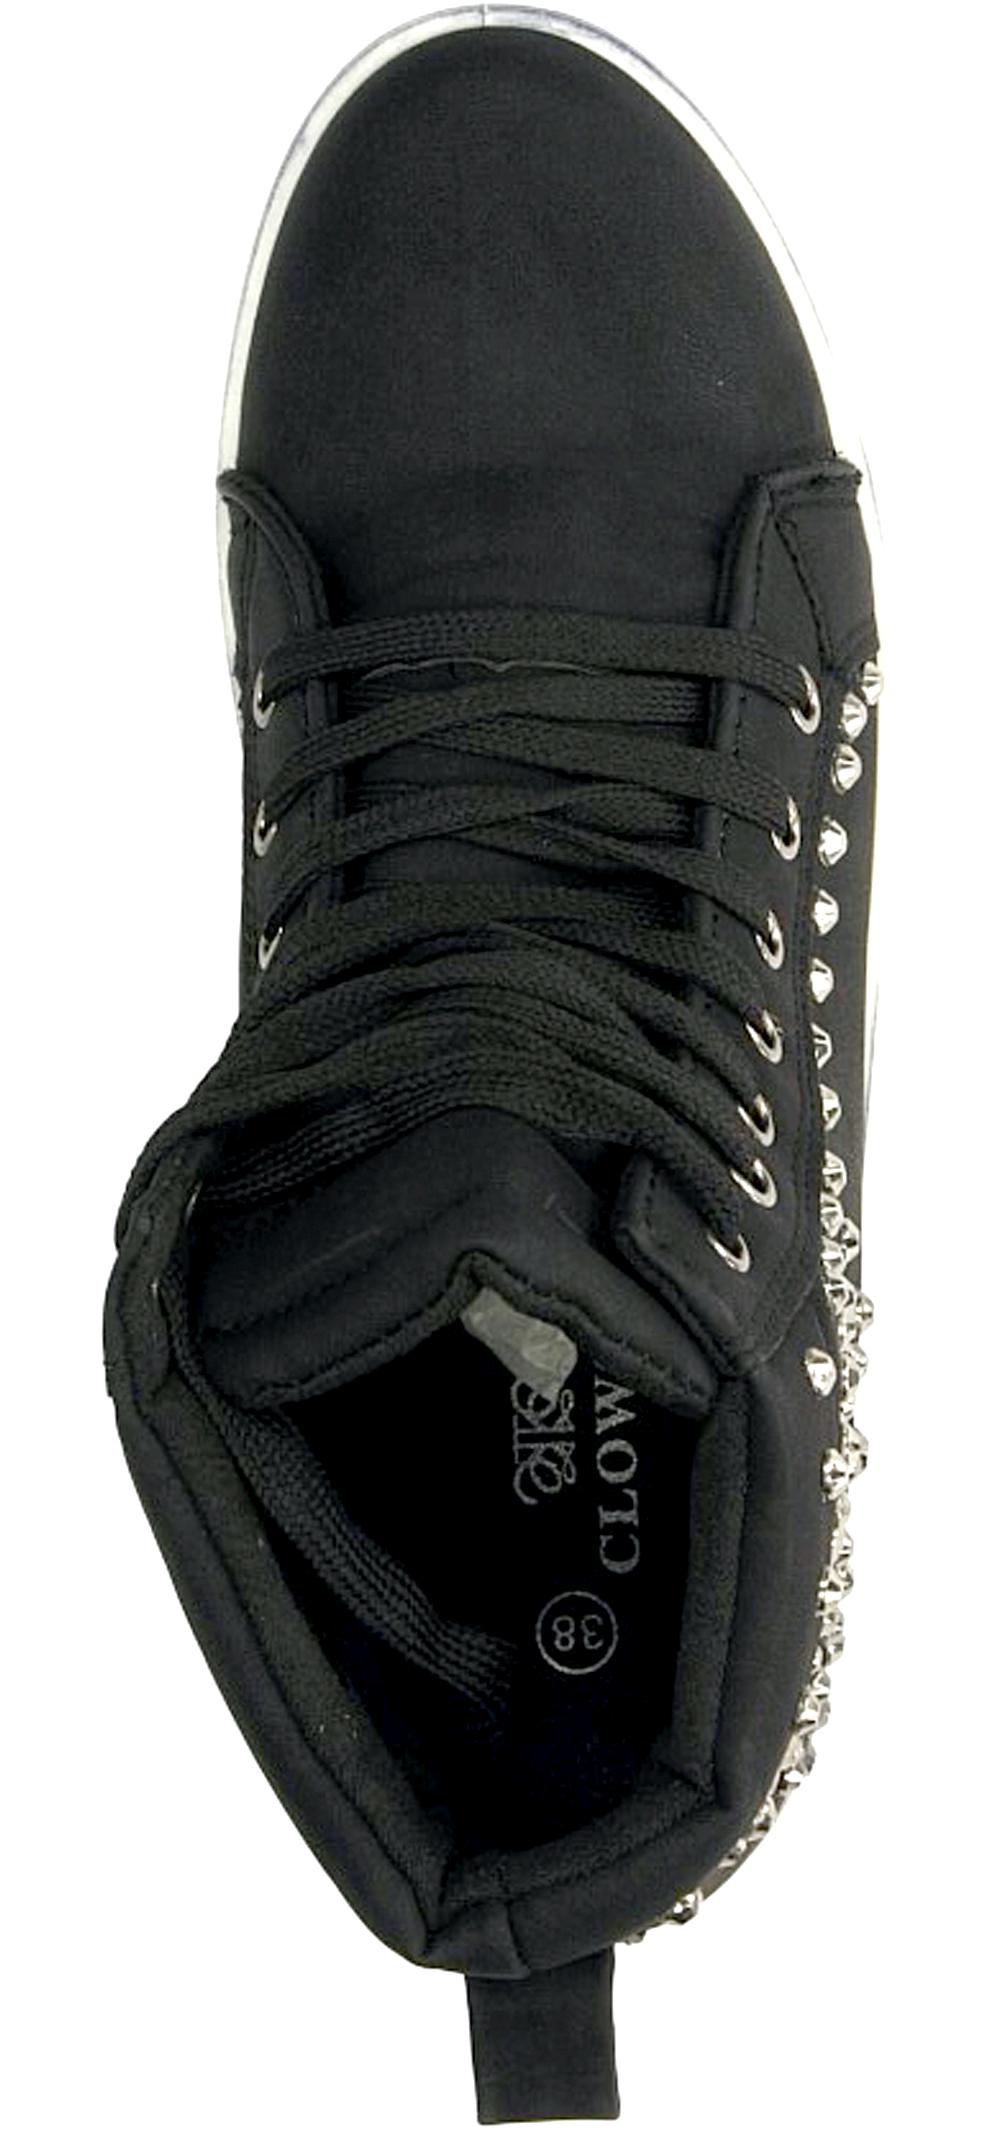 SPORTOWE CASU 8315 kolor czarny